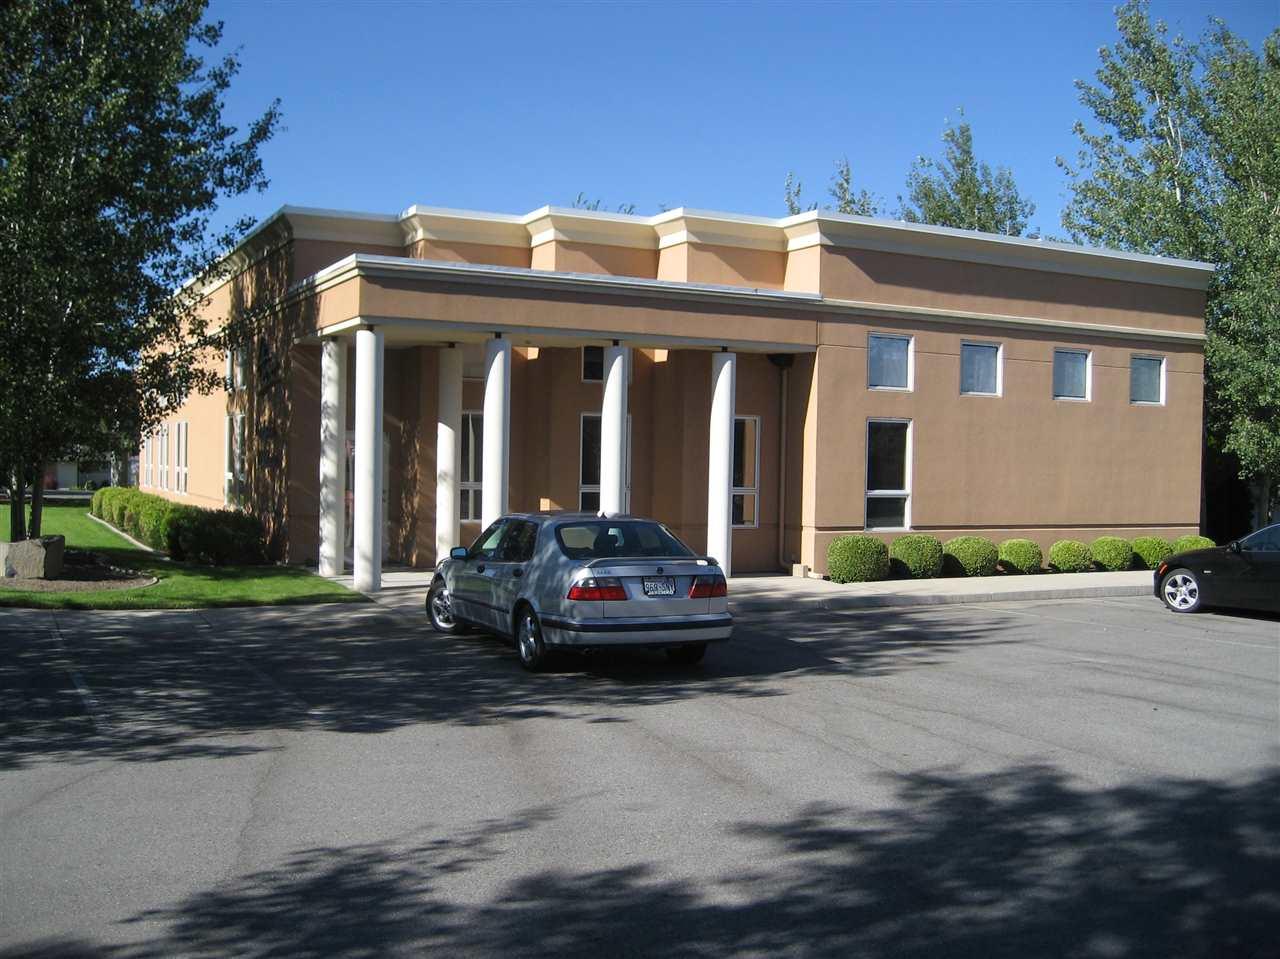 Commercial for Sale at 930 N Mullan Road 930 N Mullan Road Spokane Valley, Washington 99206 United States